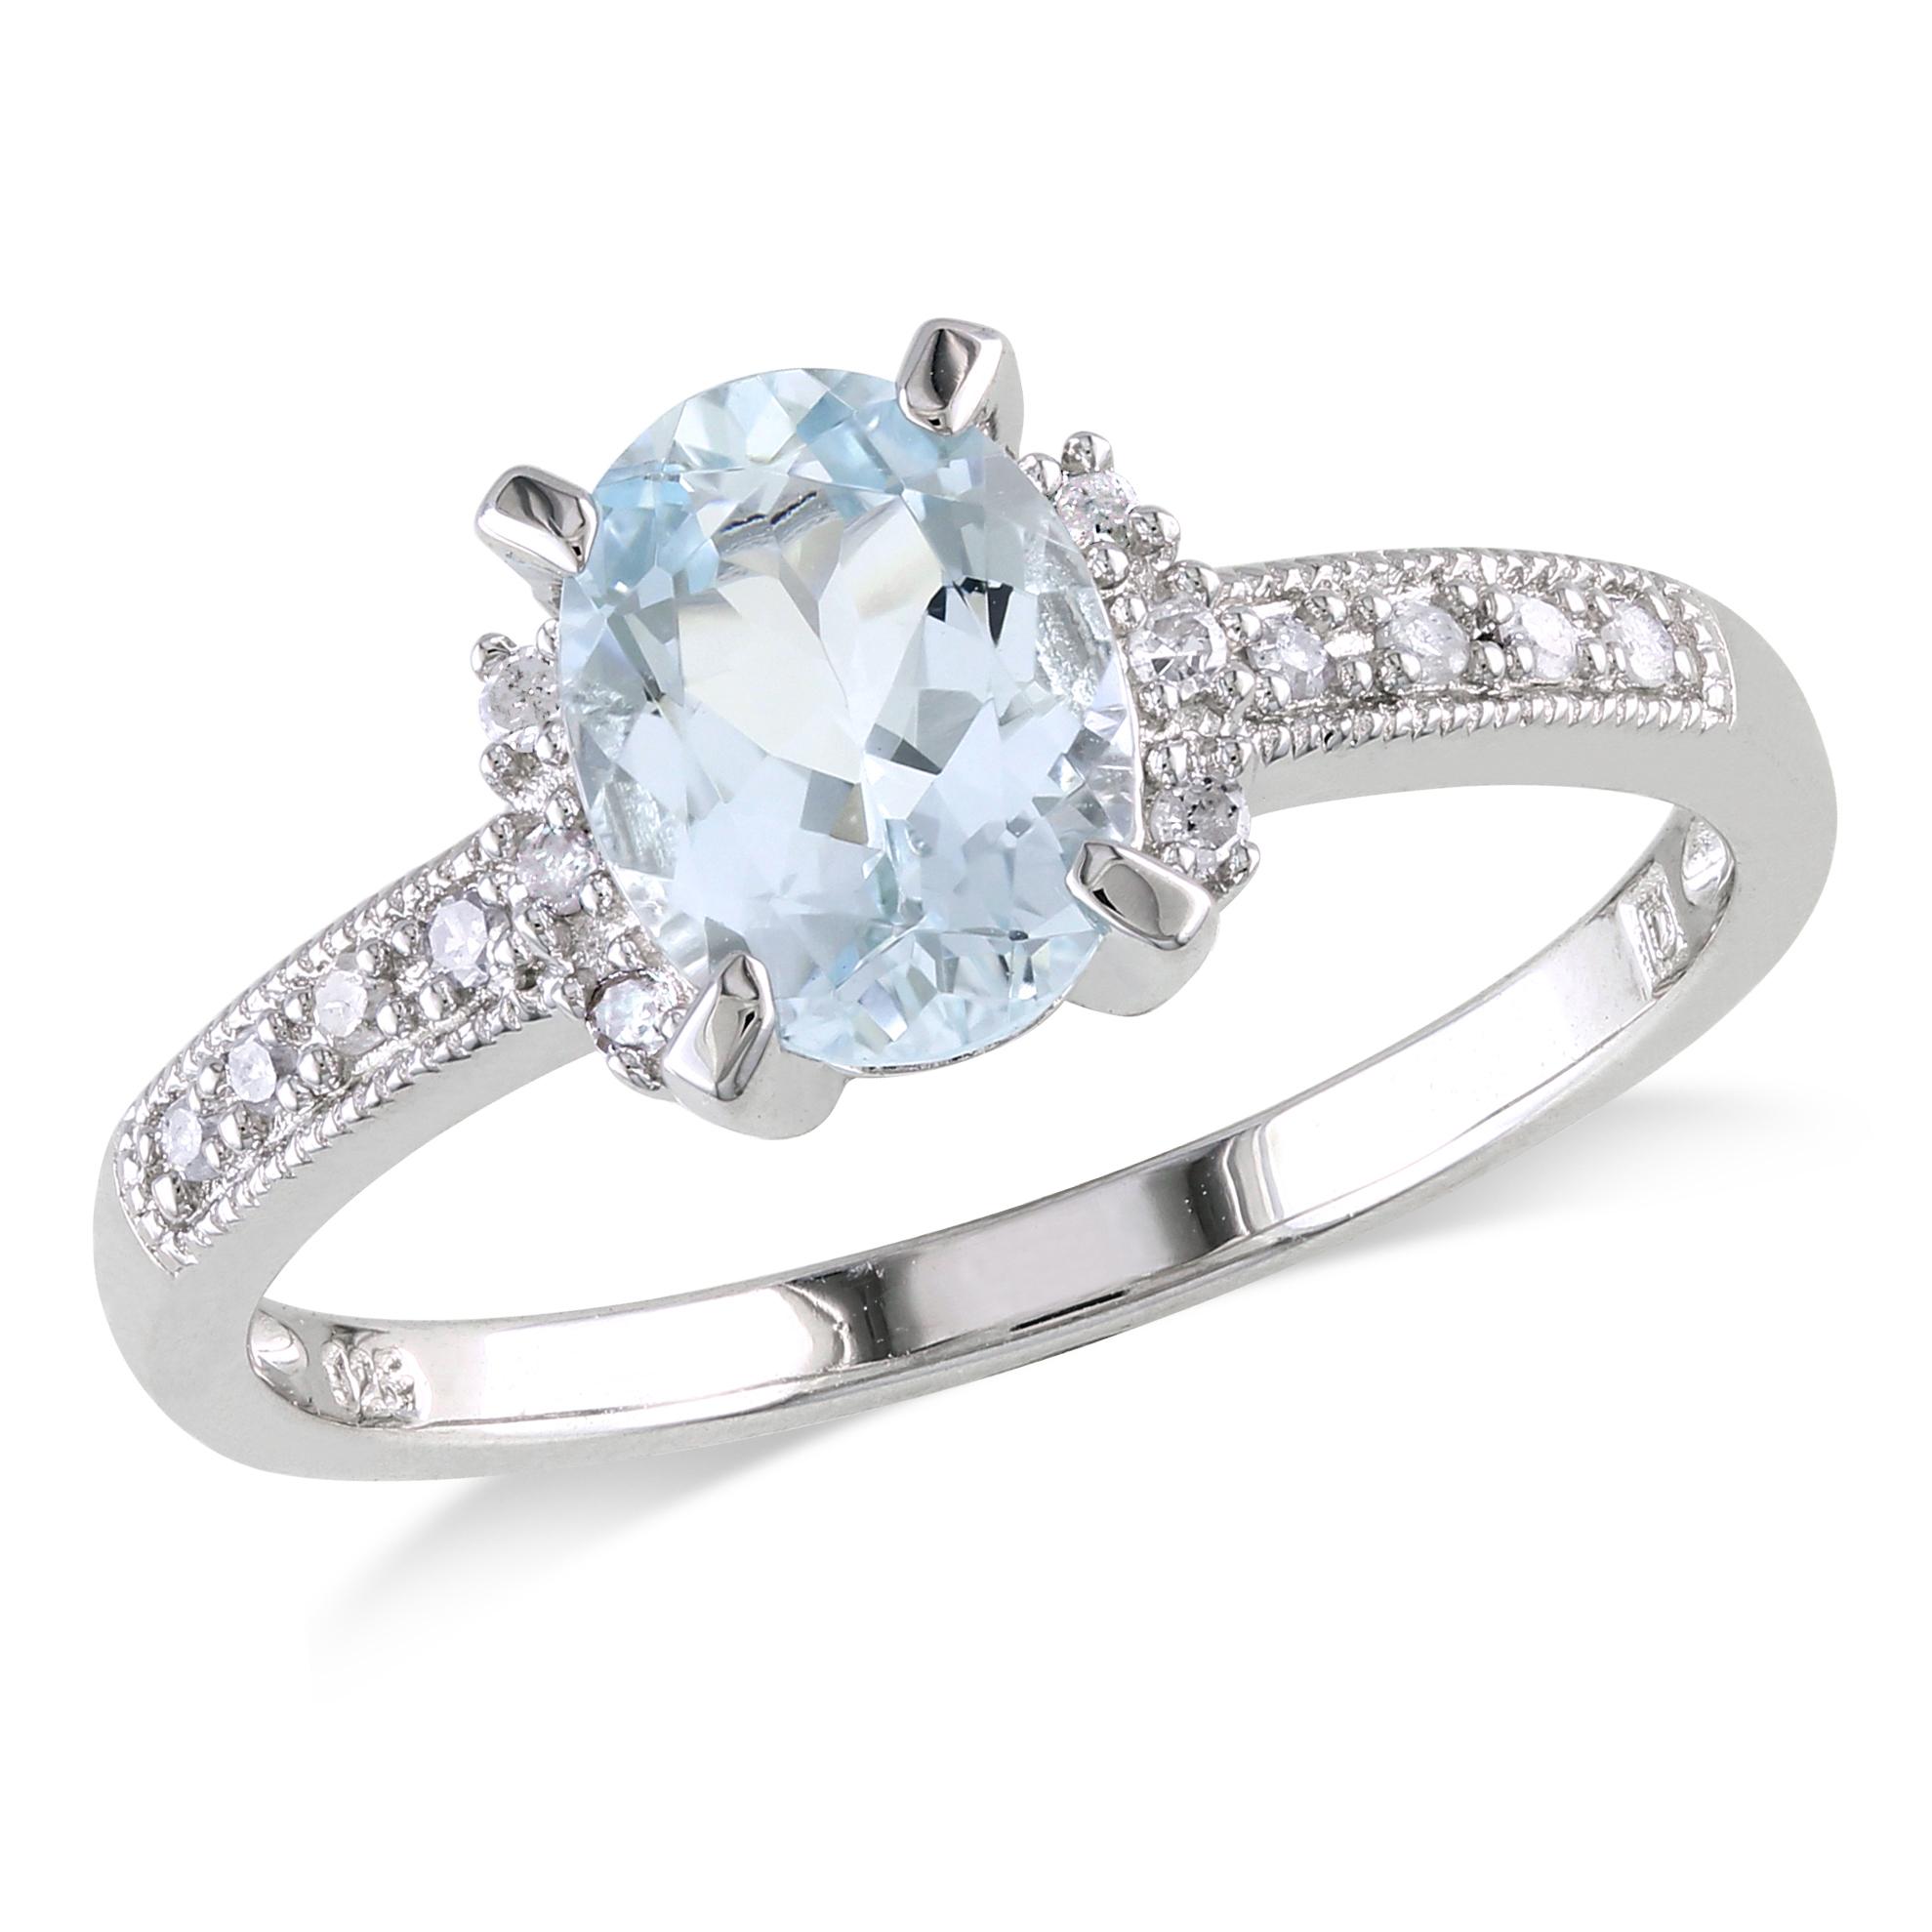 b purple wedding rings Gemstone